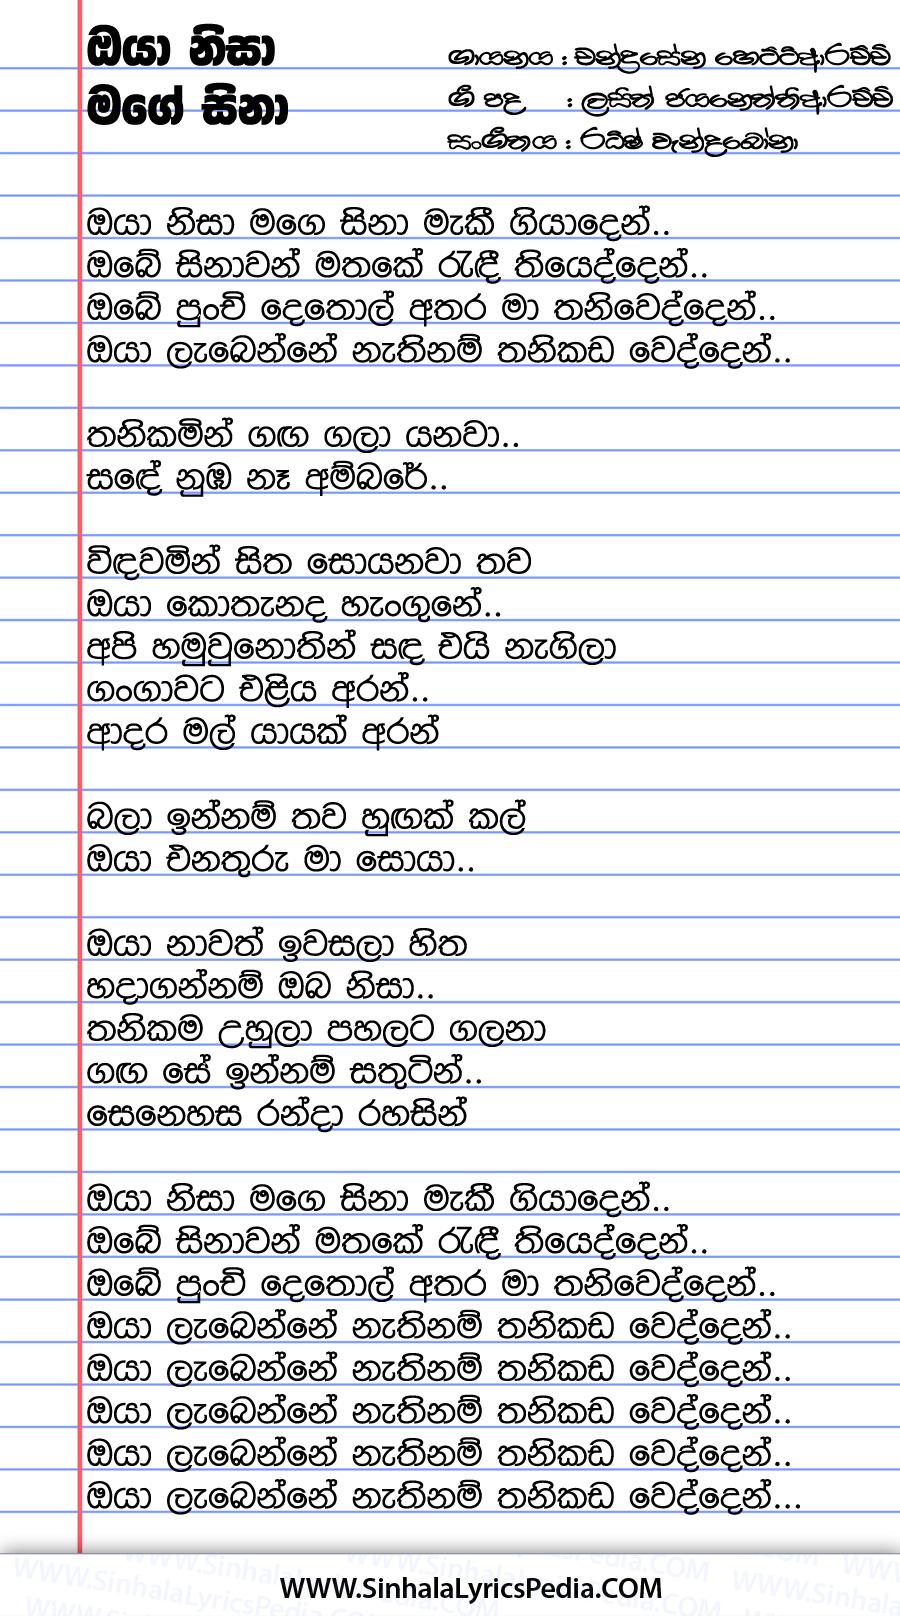 Oya Nisa Mage Sina Song Lyrics